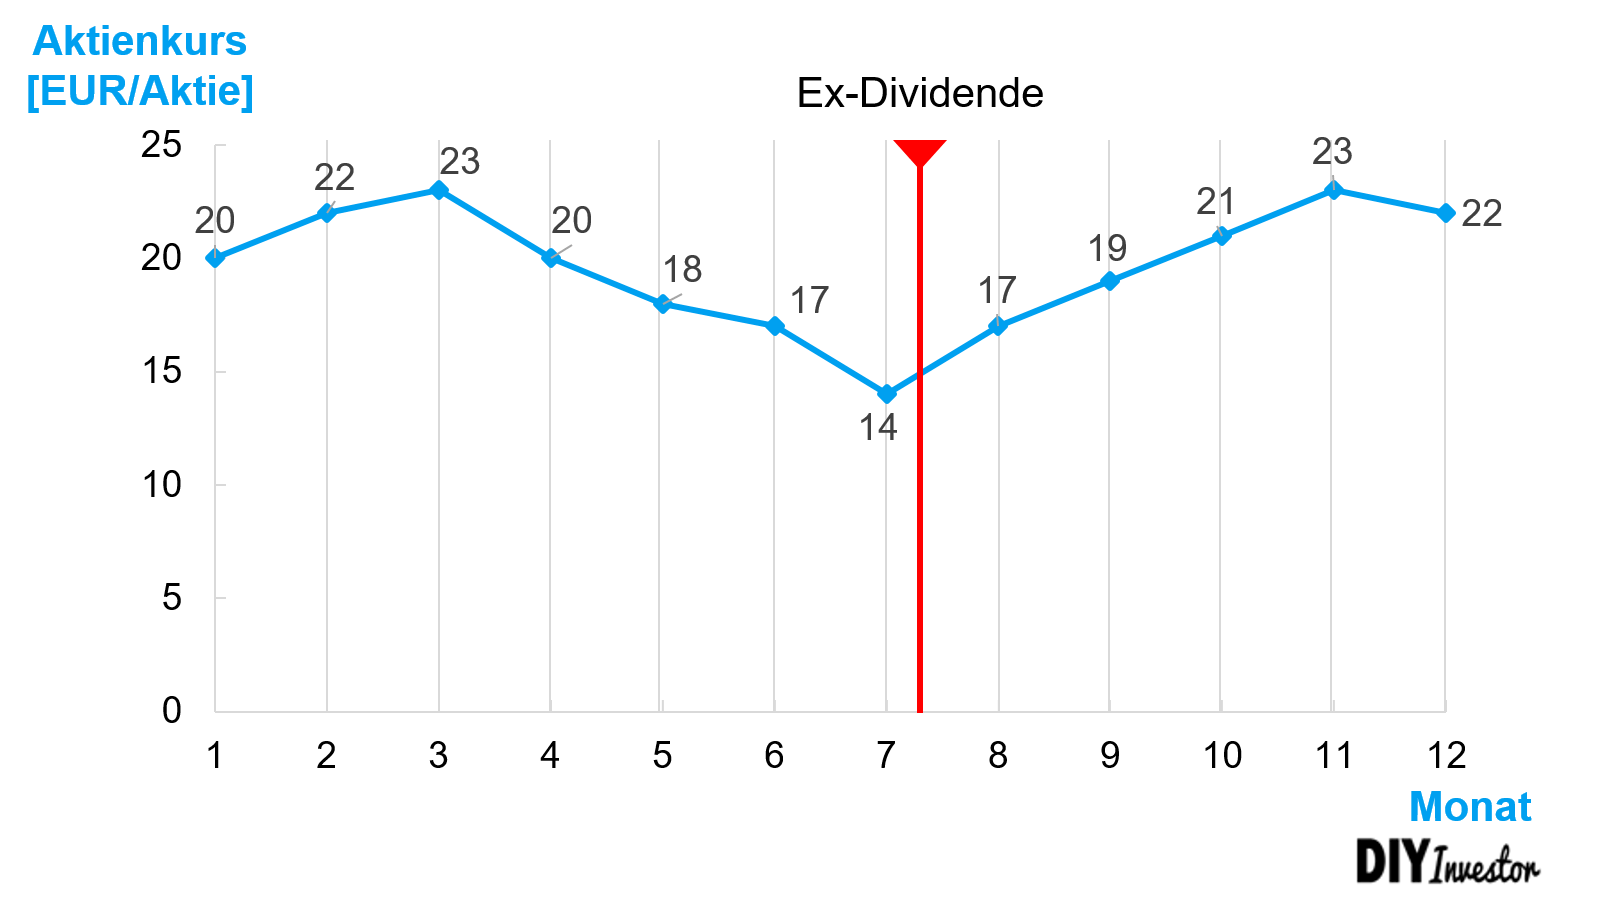 TSR - Berechnung des Total Shareholder Return